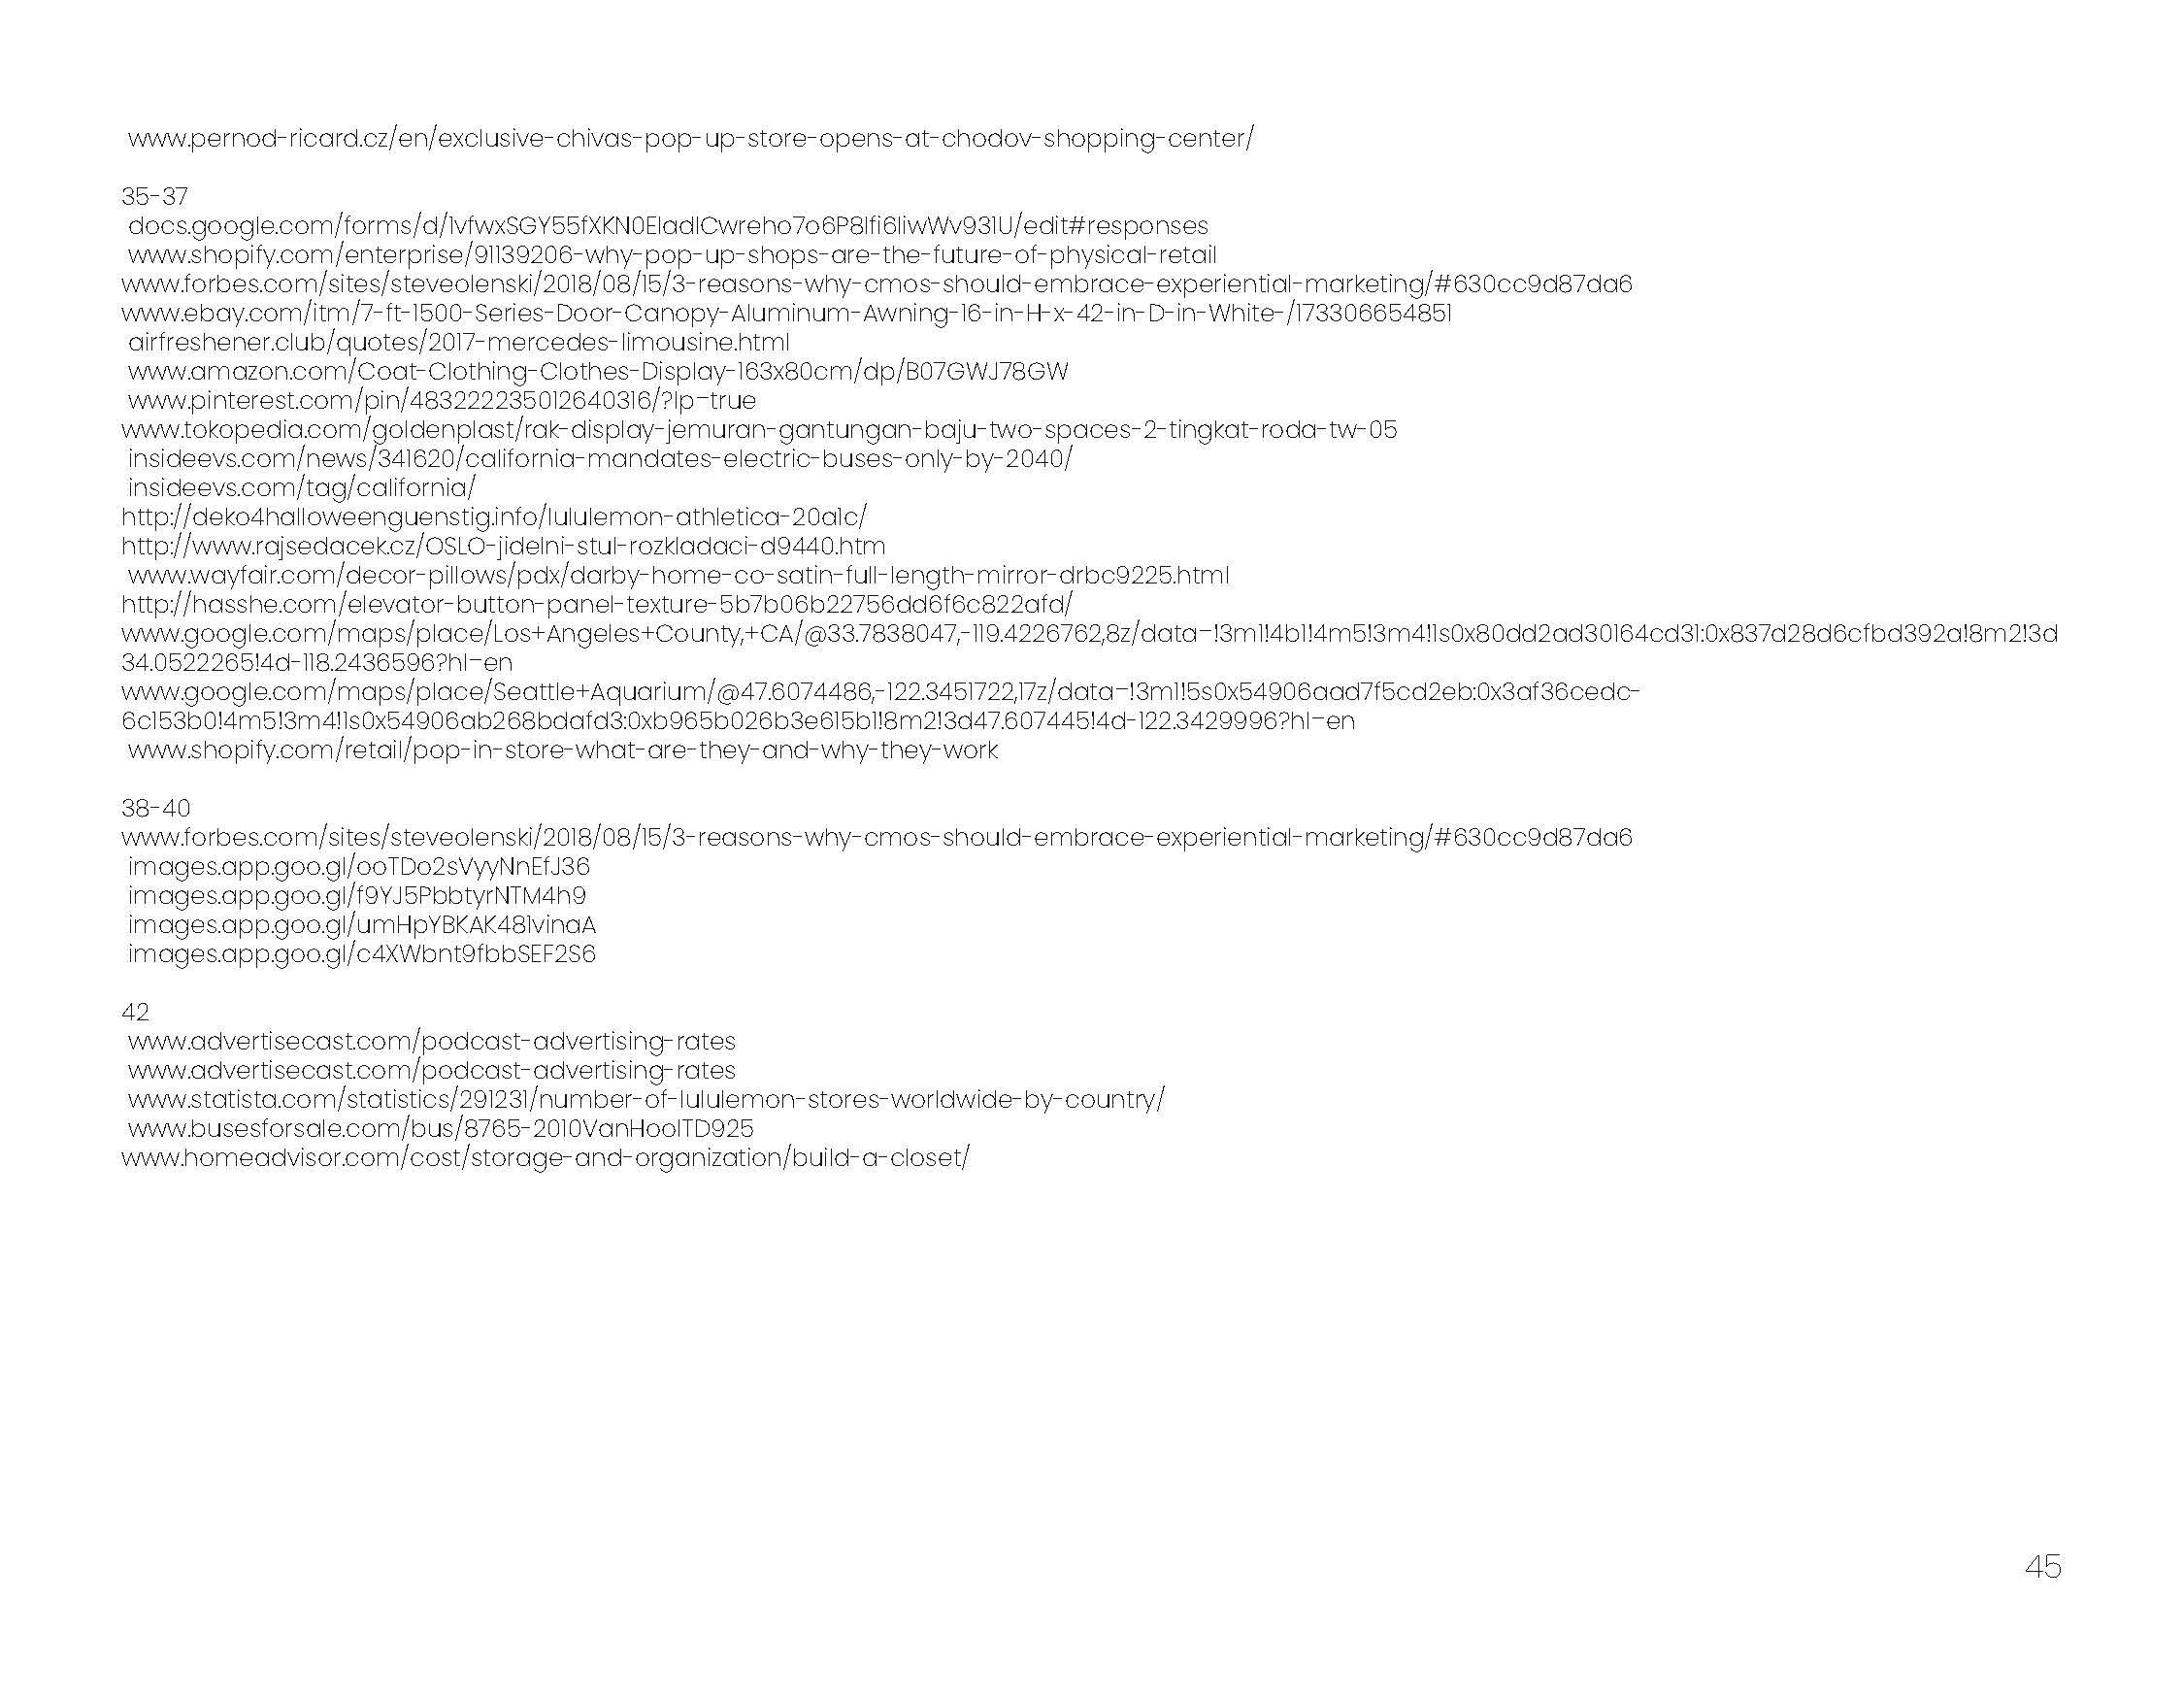 Nellah_FinalPitchBook_Portfolio_lululemon_Page_45.jpg